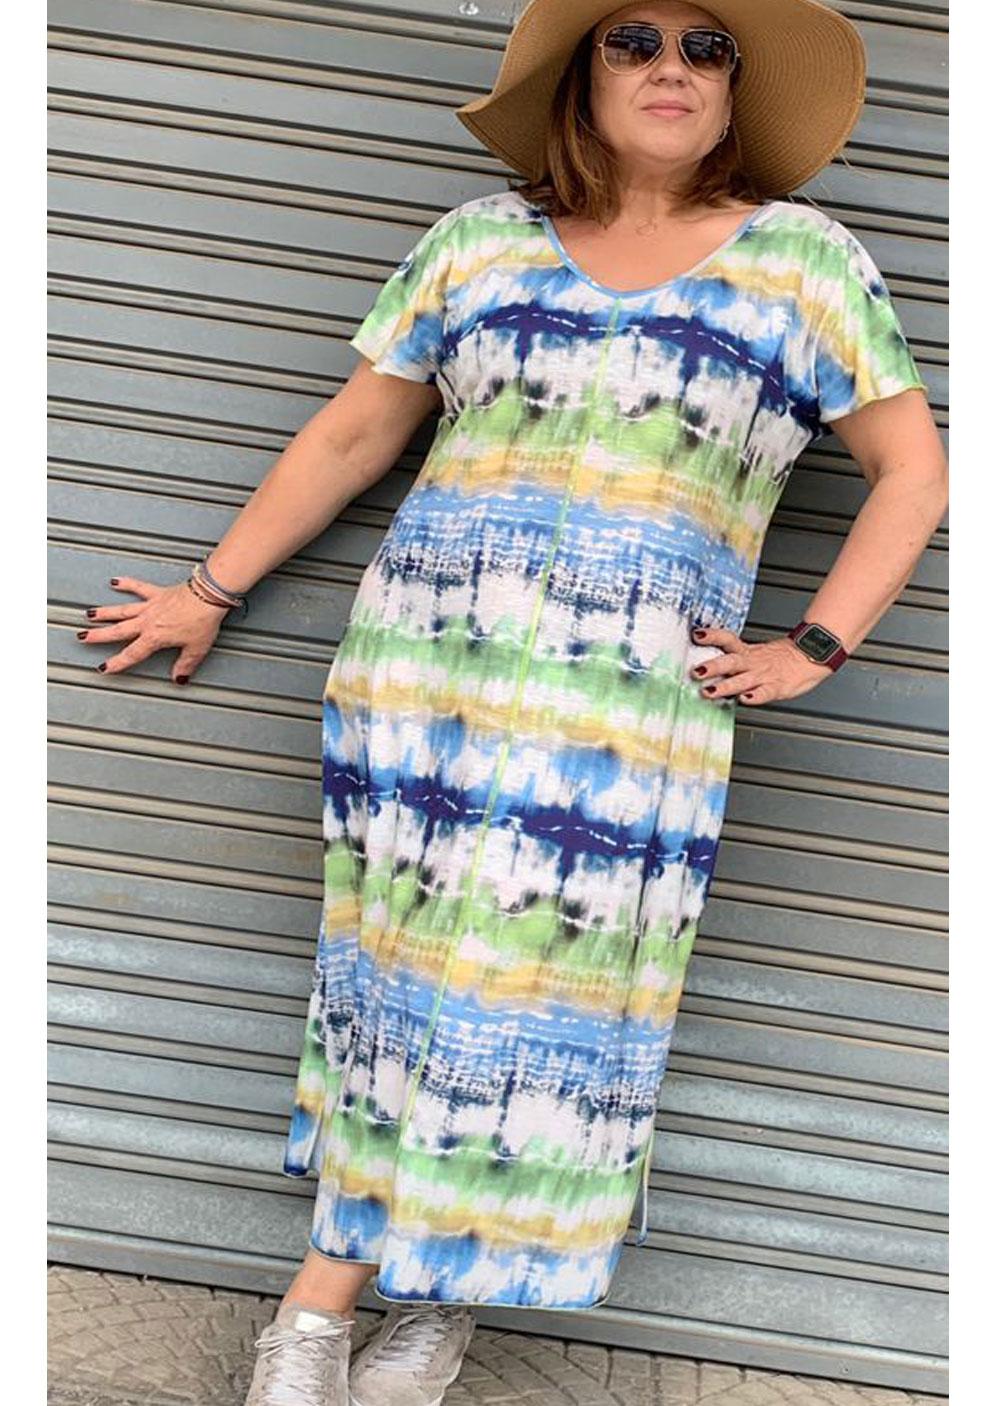 Vestido playero tallas grandes curvy verano fresco comodo fashion tie dye